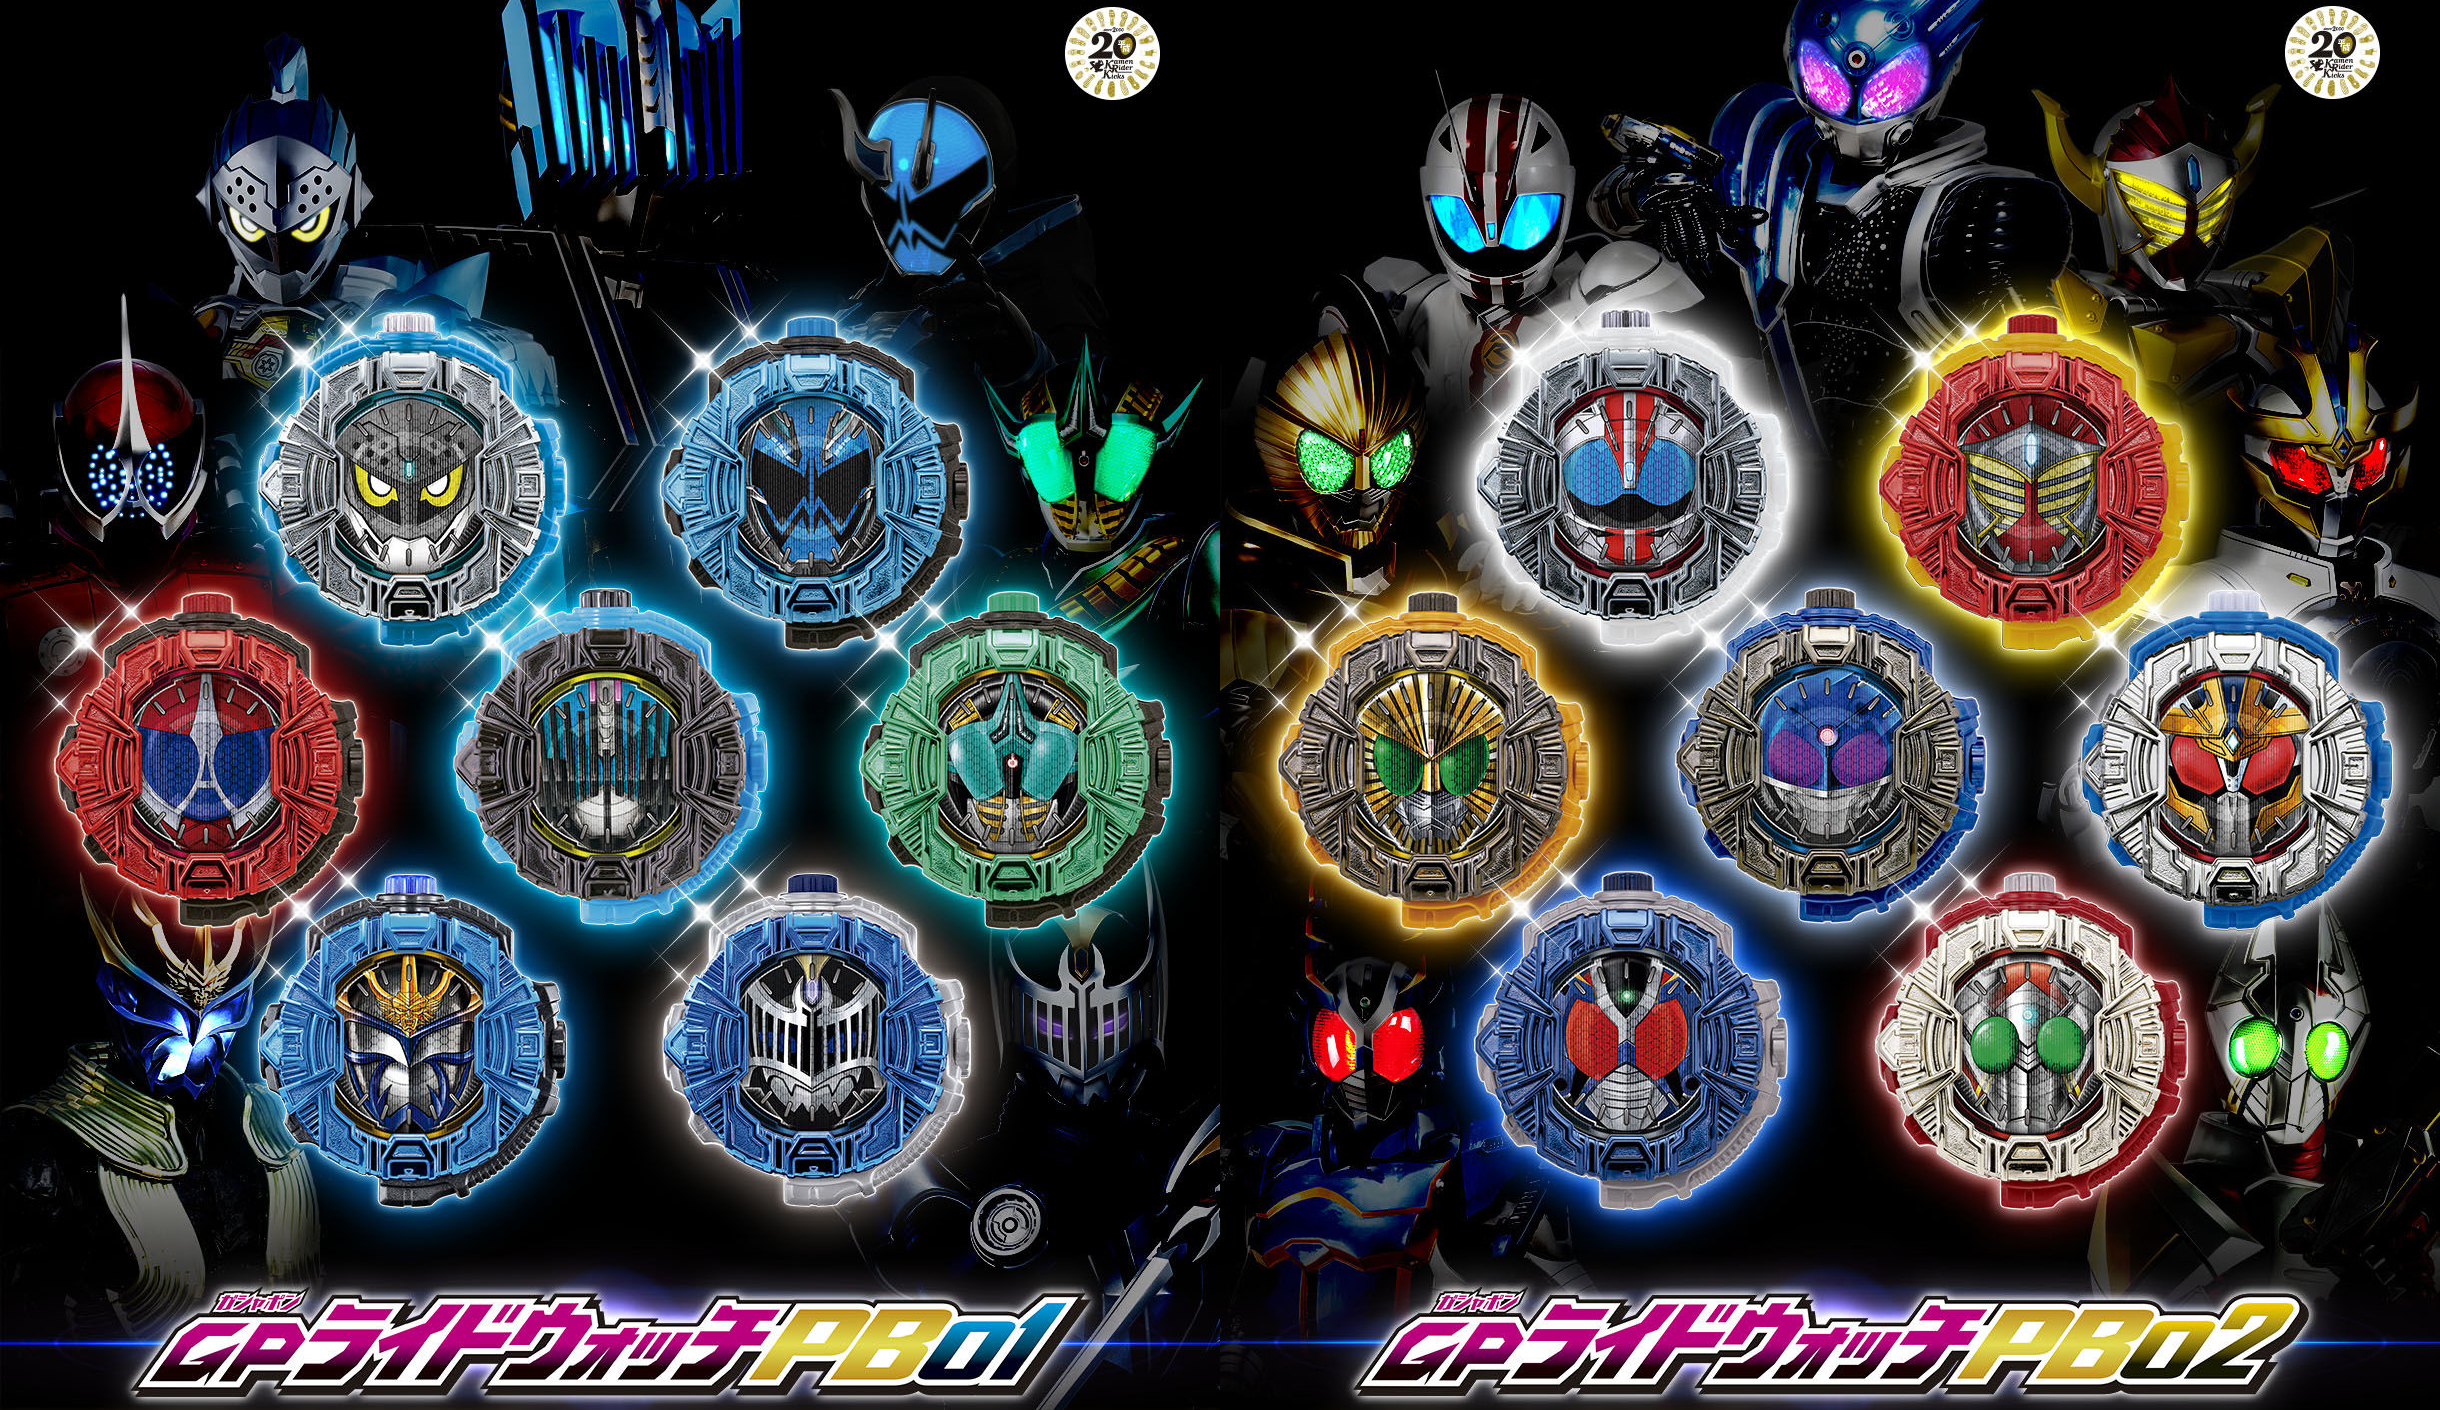 Kamen Rider Zi-O Sound Ridewatch Series Gashapon Premium Bandai 01 & 02